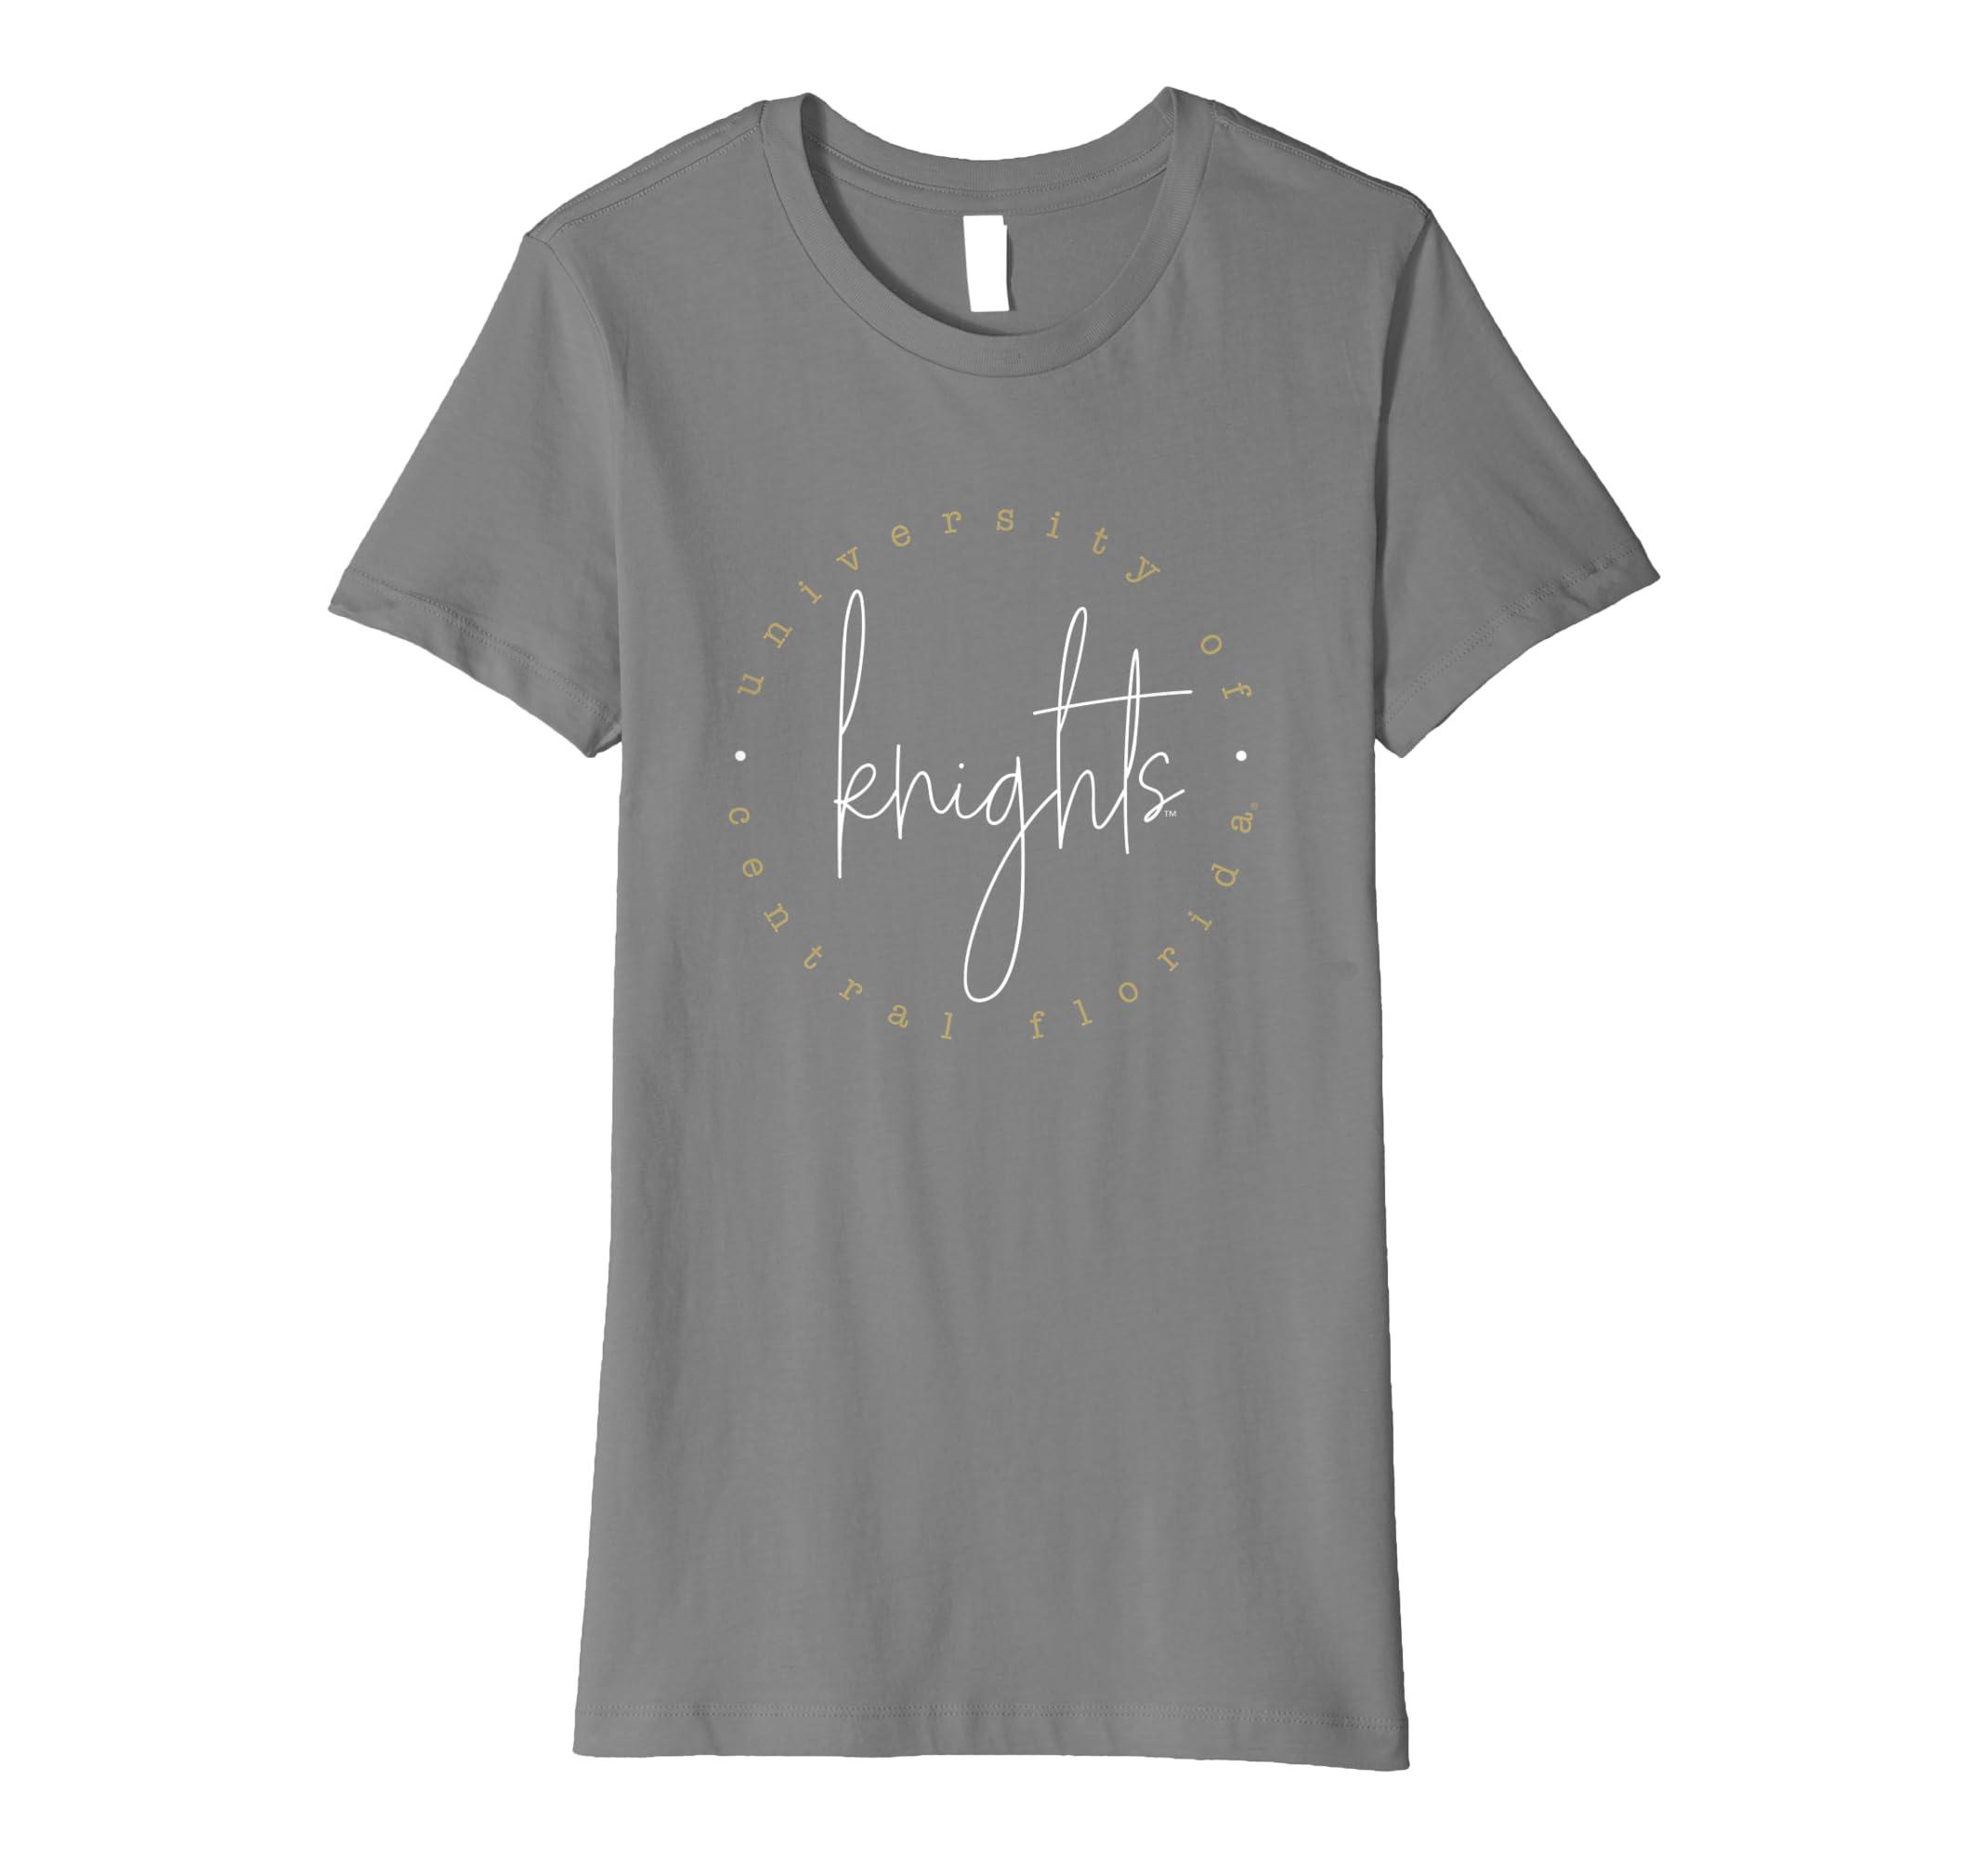 1d36ceca Womens UCF Knights Women's College NCAA T-Shirt RYLCF14-prm – Paramatee